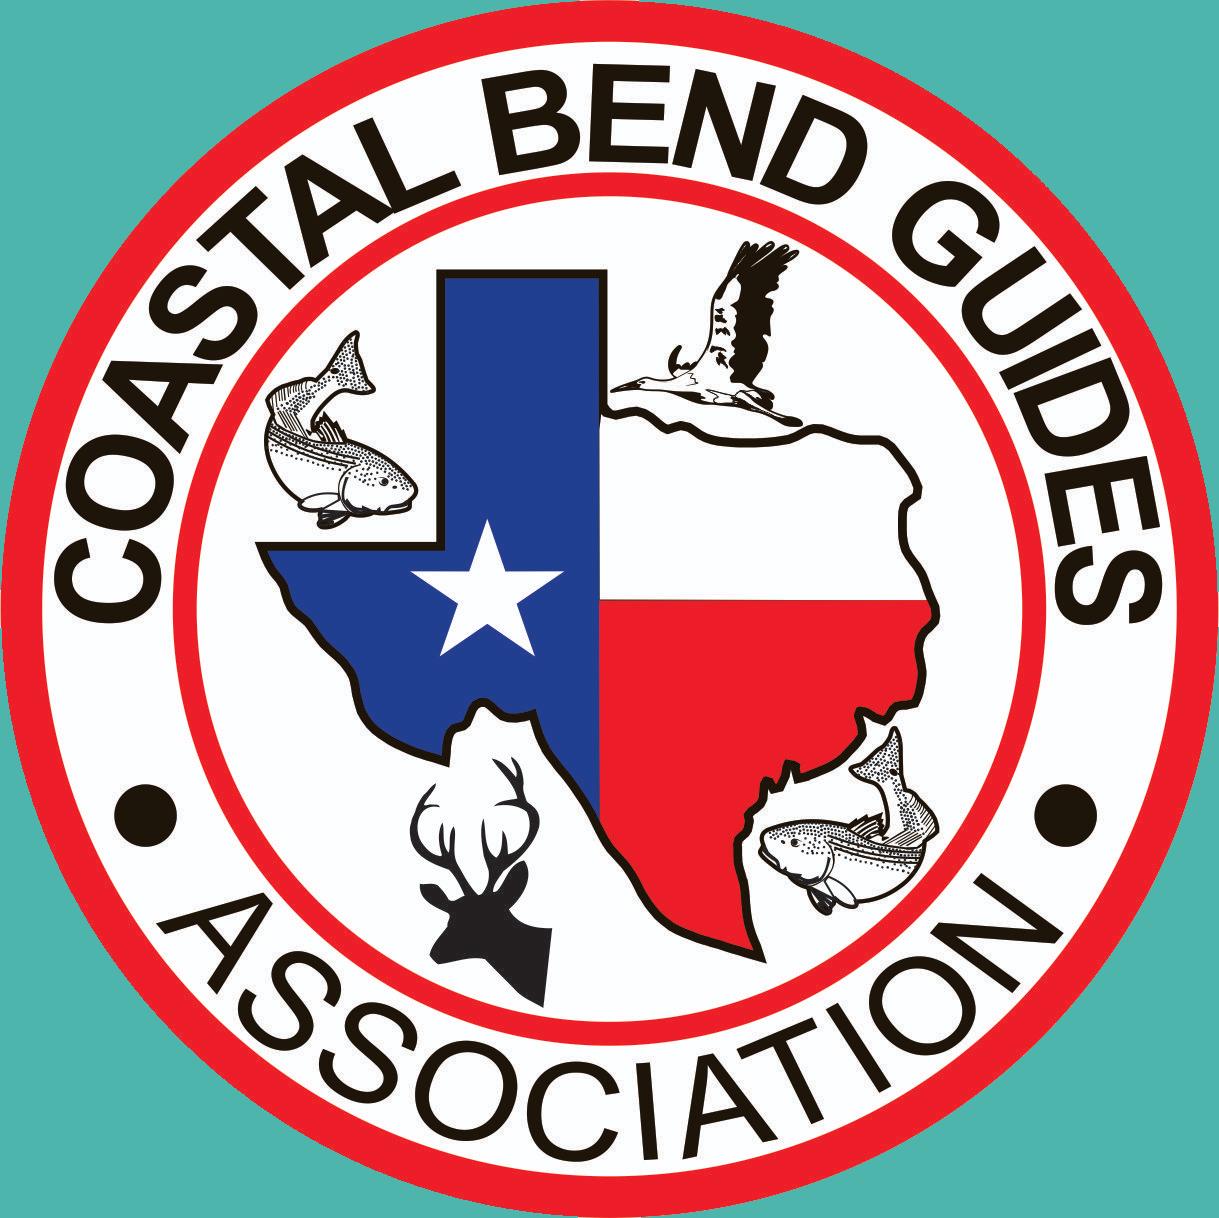 Coastal Bend Guides Association